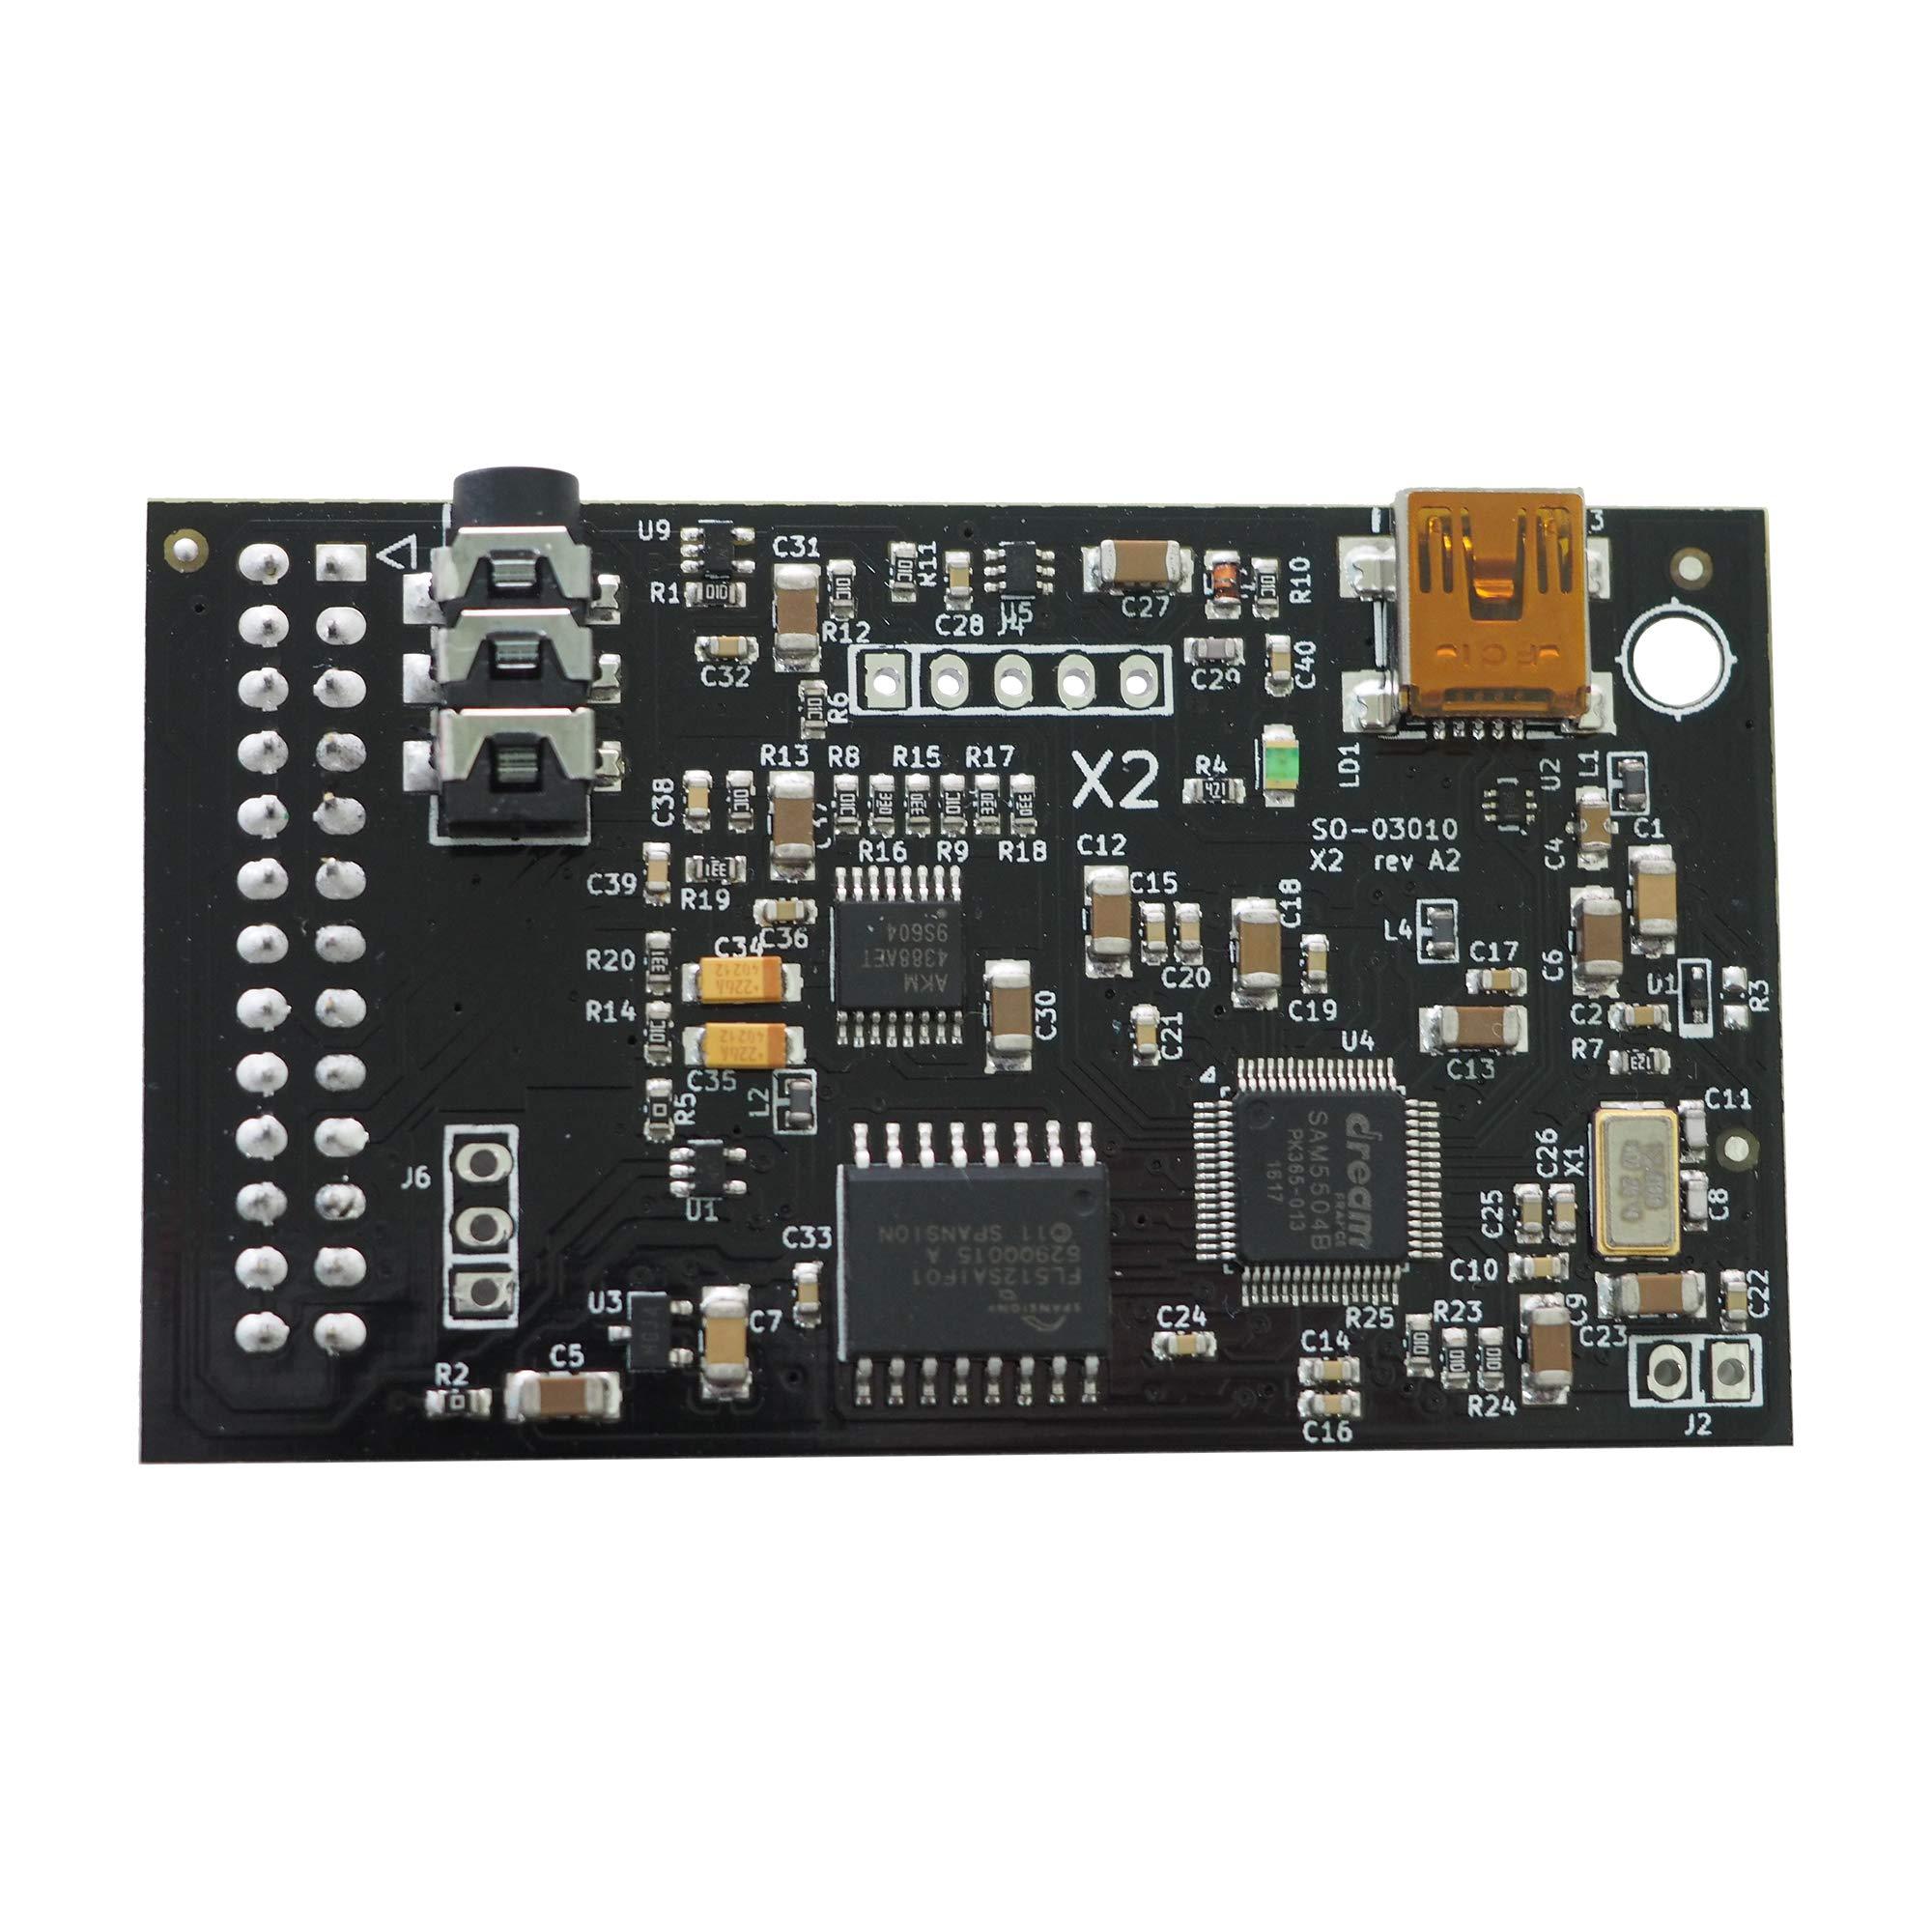 Dreamblaster X2 Daughterboard Waveblaster MIDI Yamaha DB50XG NEC XR385 type card by ExcelValley